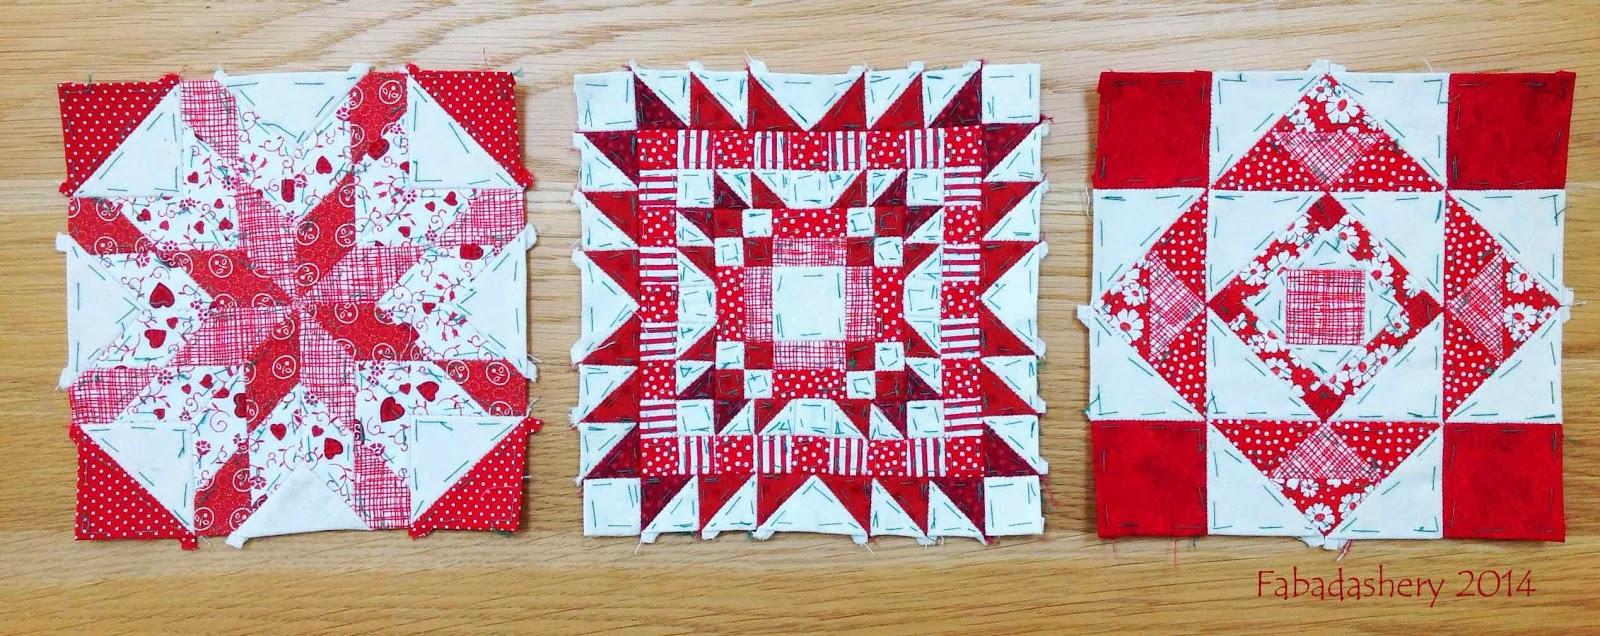 Nearly Insane Quilt Blocks - Draw 20